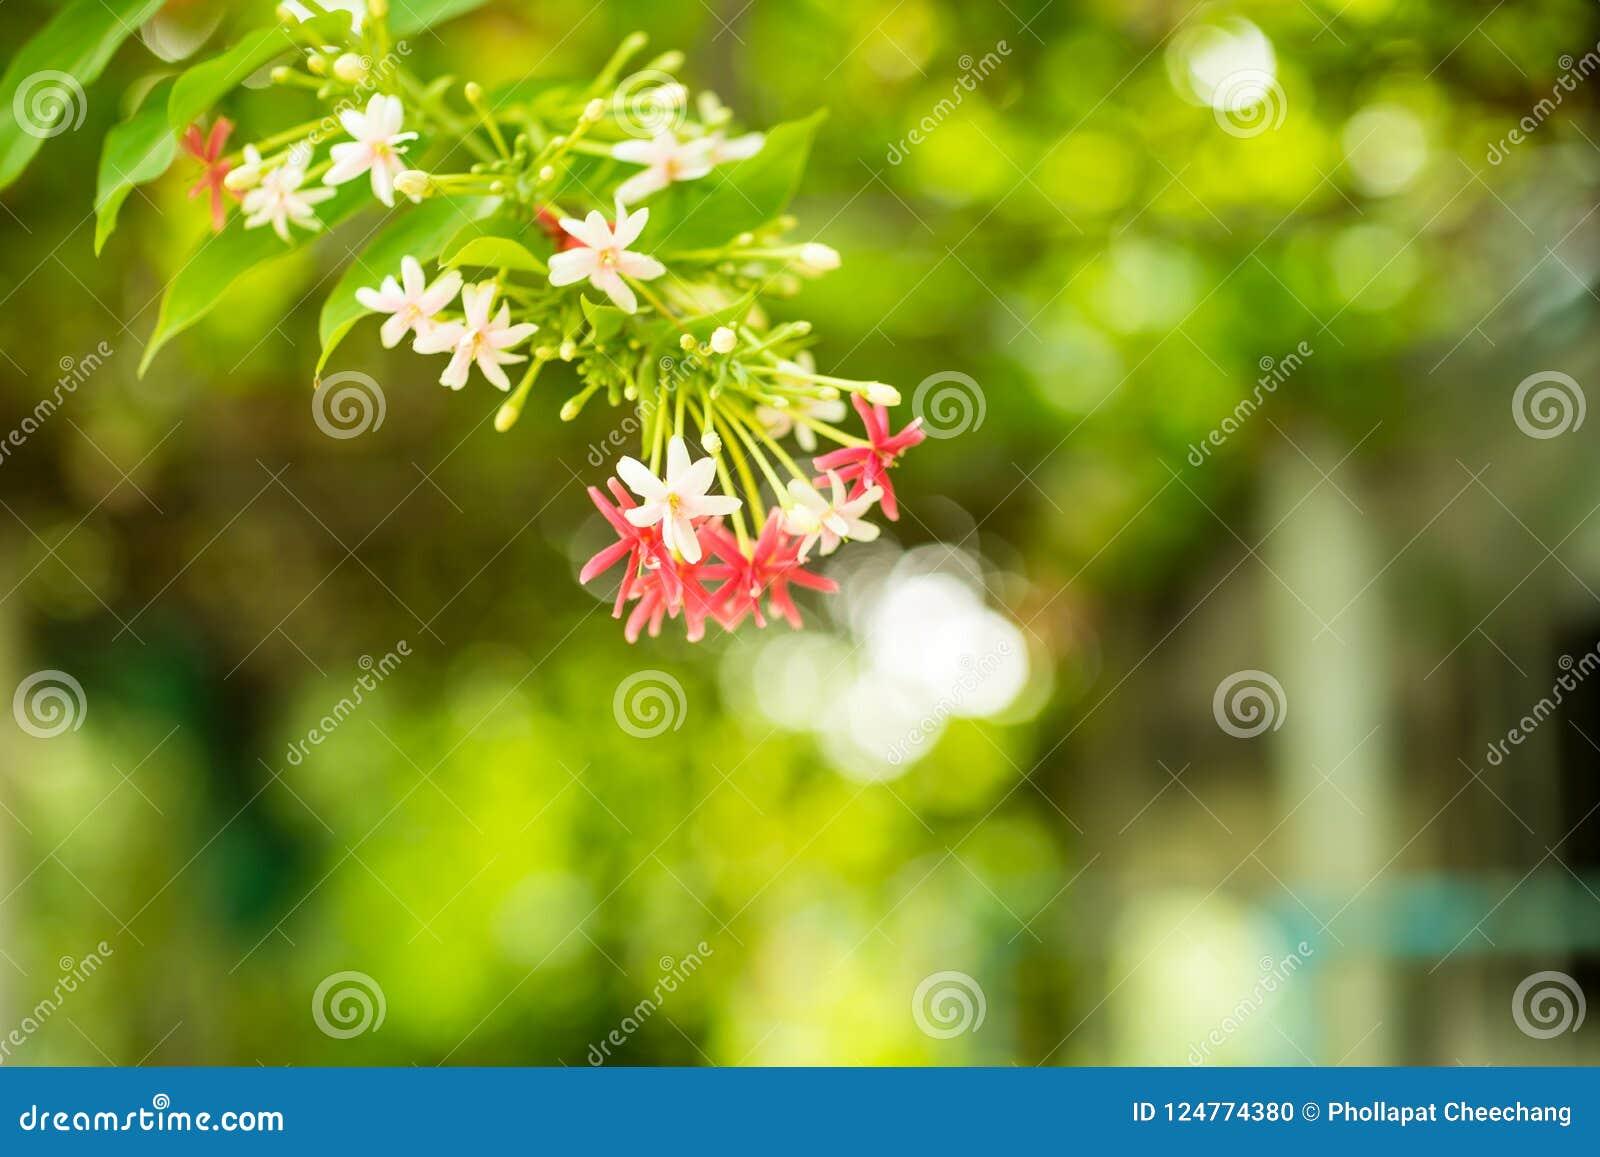 Combretum indicum rangoon flowers petal colorful beautiful flowers download combretum indicum rangoon flowers petal colorful beautiful flowers in nature background stock photo image izmirmasajfo